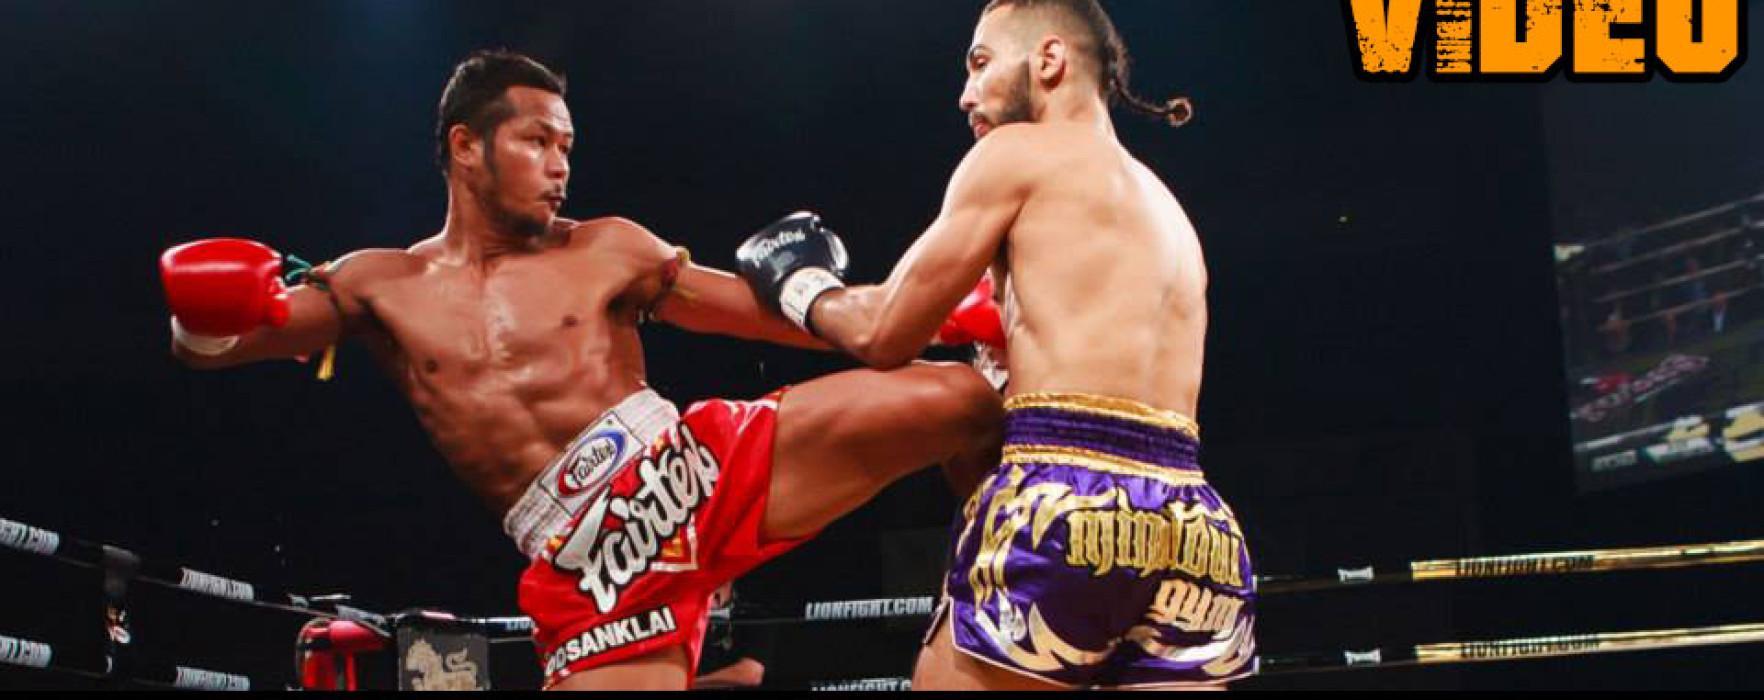 Video: Yodsanklai Fairtex vs Salah Khalifa – Lion Fight 18 – Las Vegas – 5th September 2014